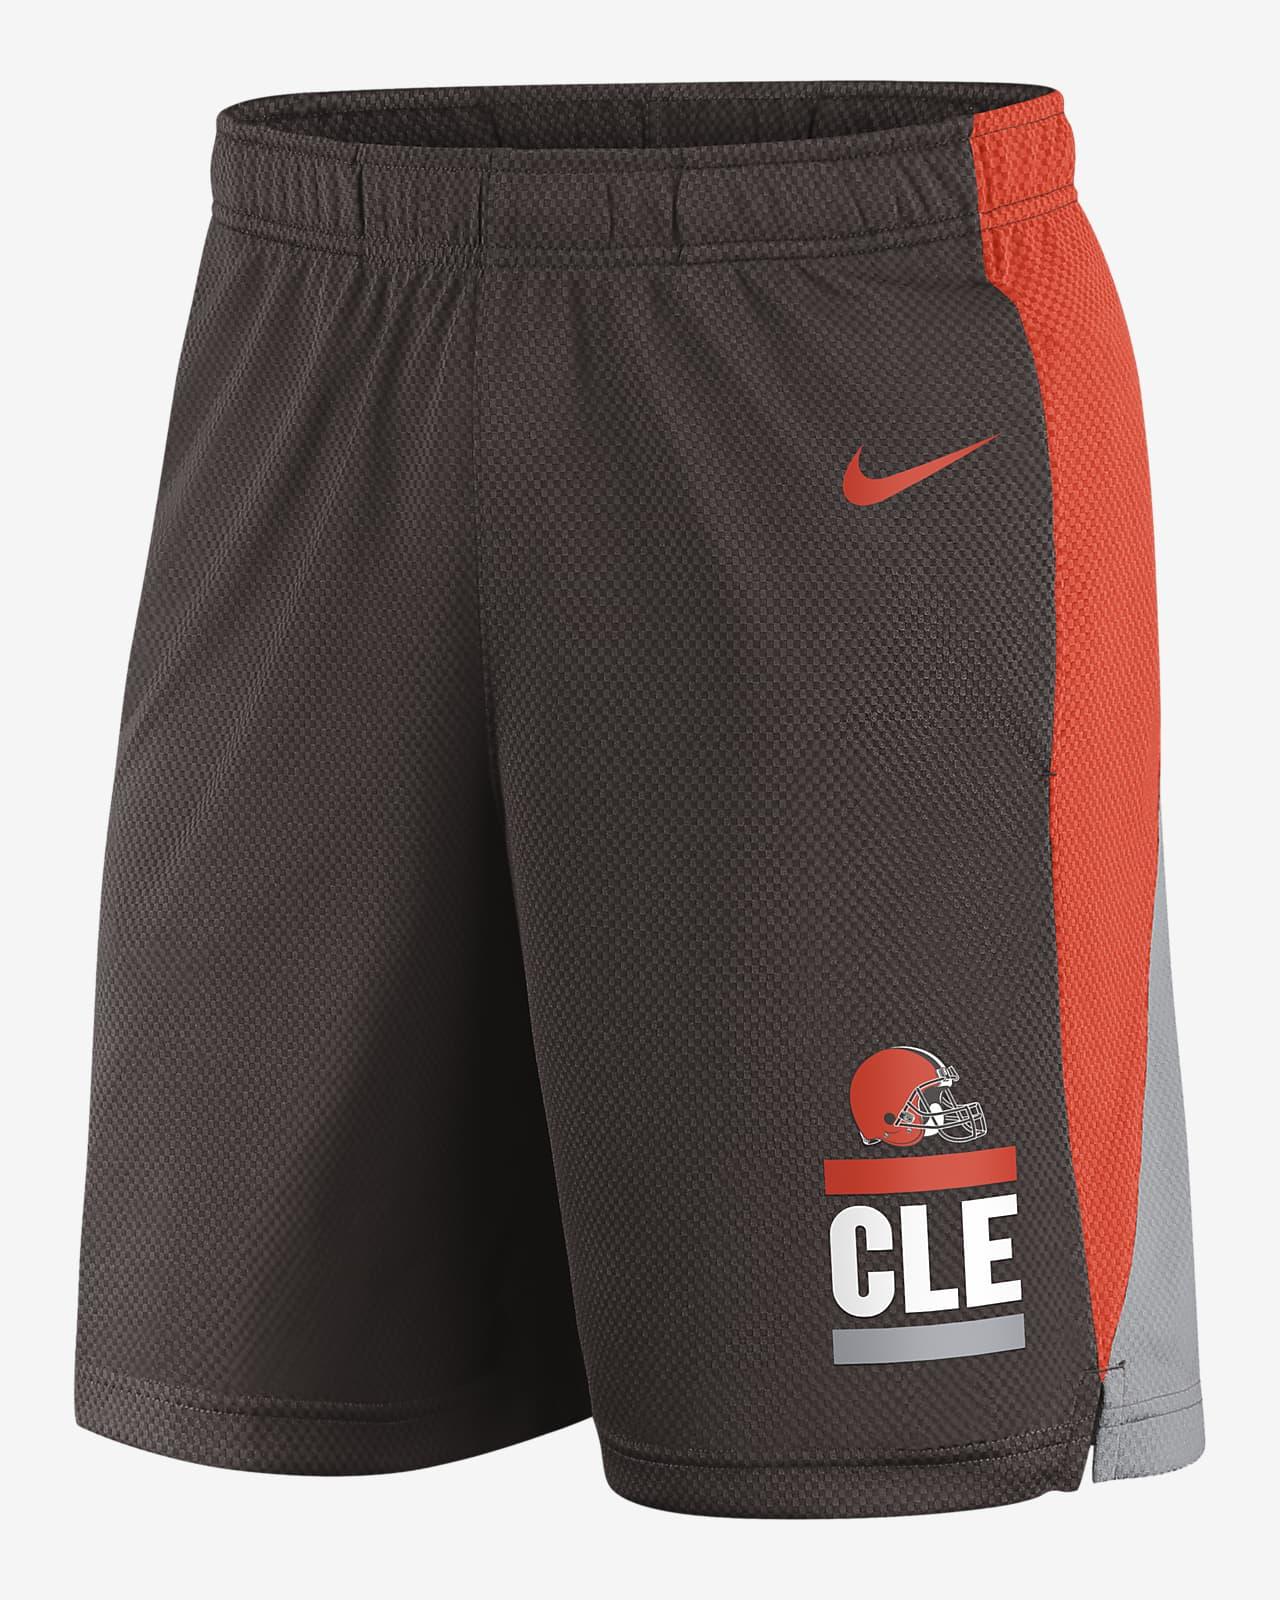 Nike Dri-FIT Broadcast (NFL Cleveland Browns) Men's Shorts